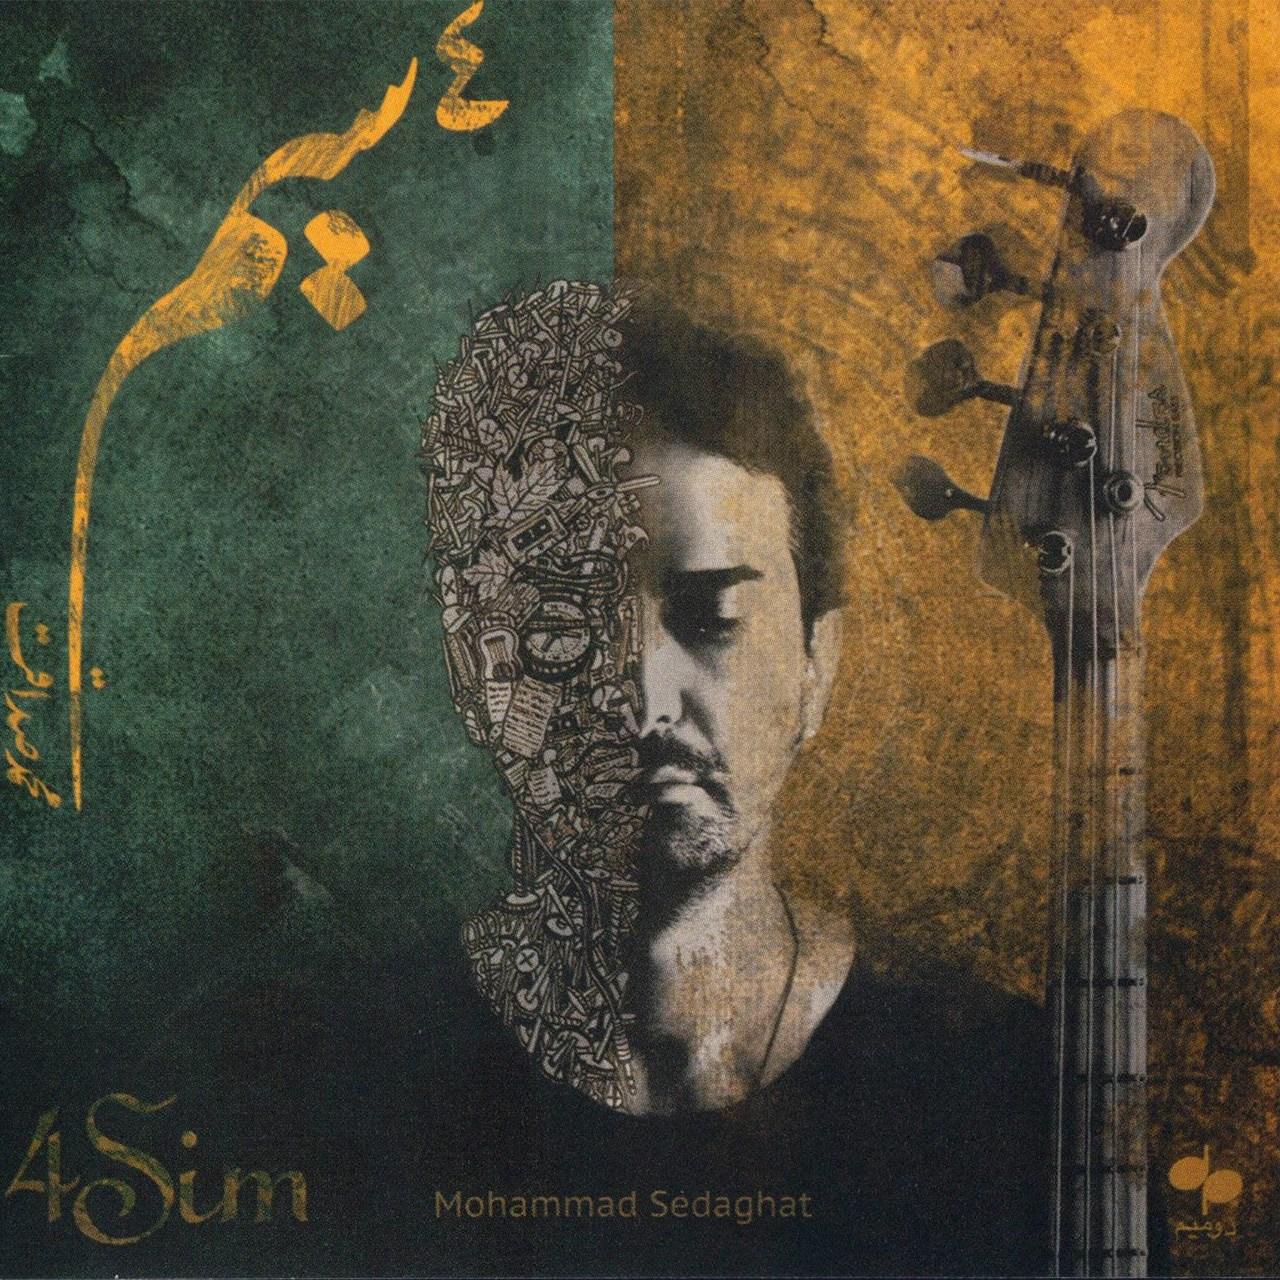 آلبوم موسیقی 4 سیم اثر محمد صداقت